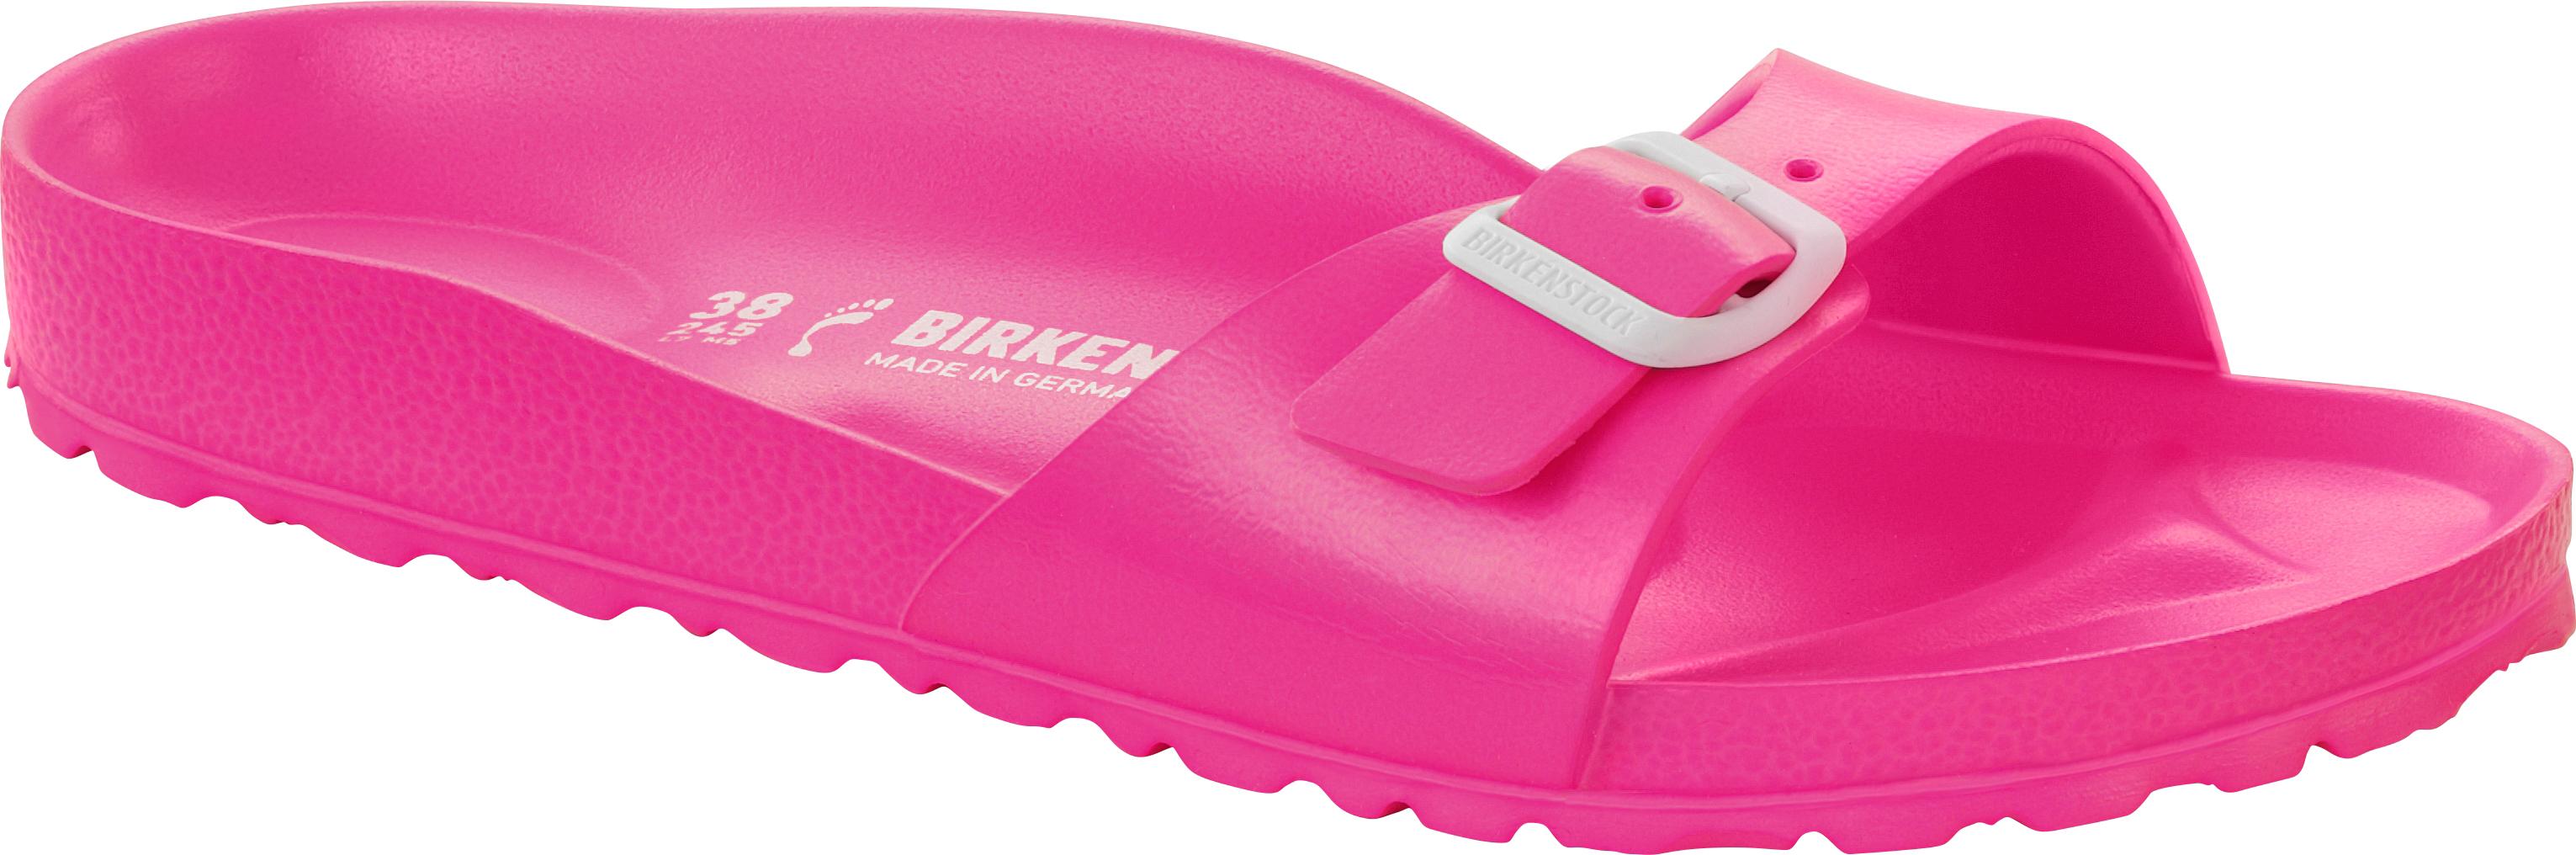 6aa684d11dc MADRID EVA SLIM Sandal 2019 neon pink. BIRKENSTOCK BIRKENSTOCK. Colour and  item alternatives